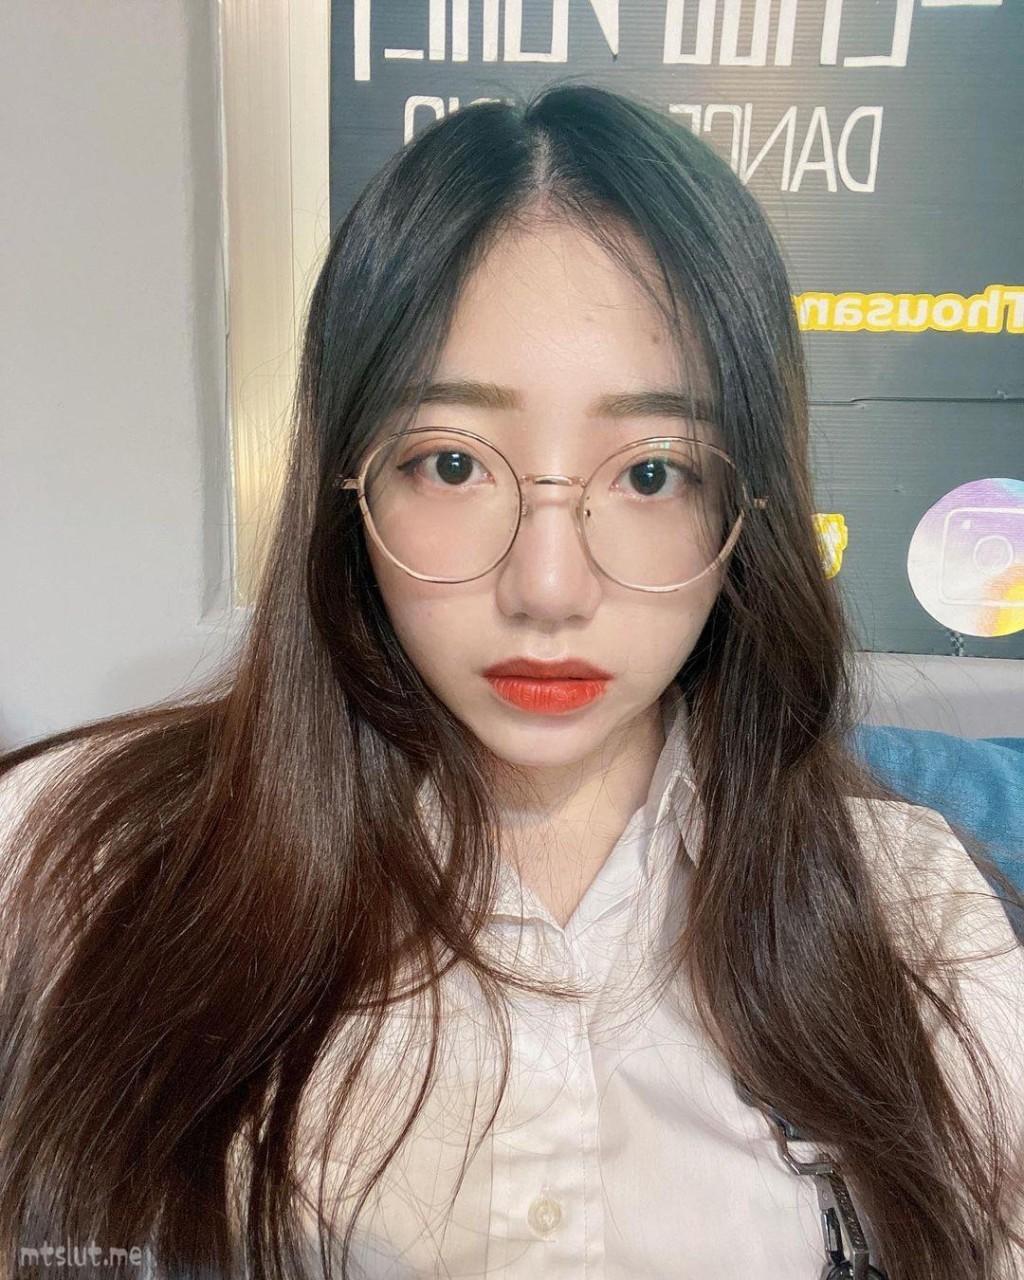 ins妹子图-精选-20210510